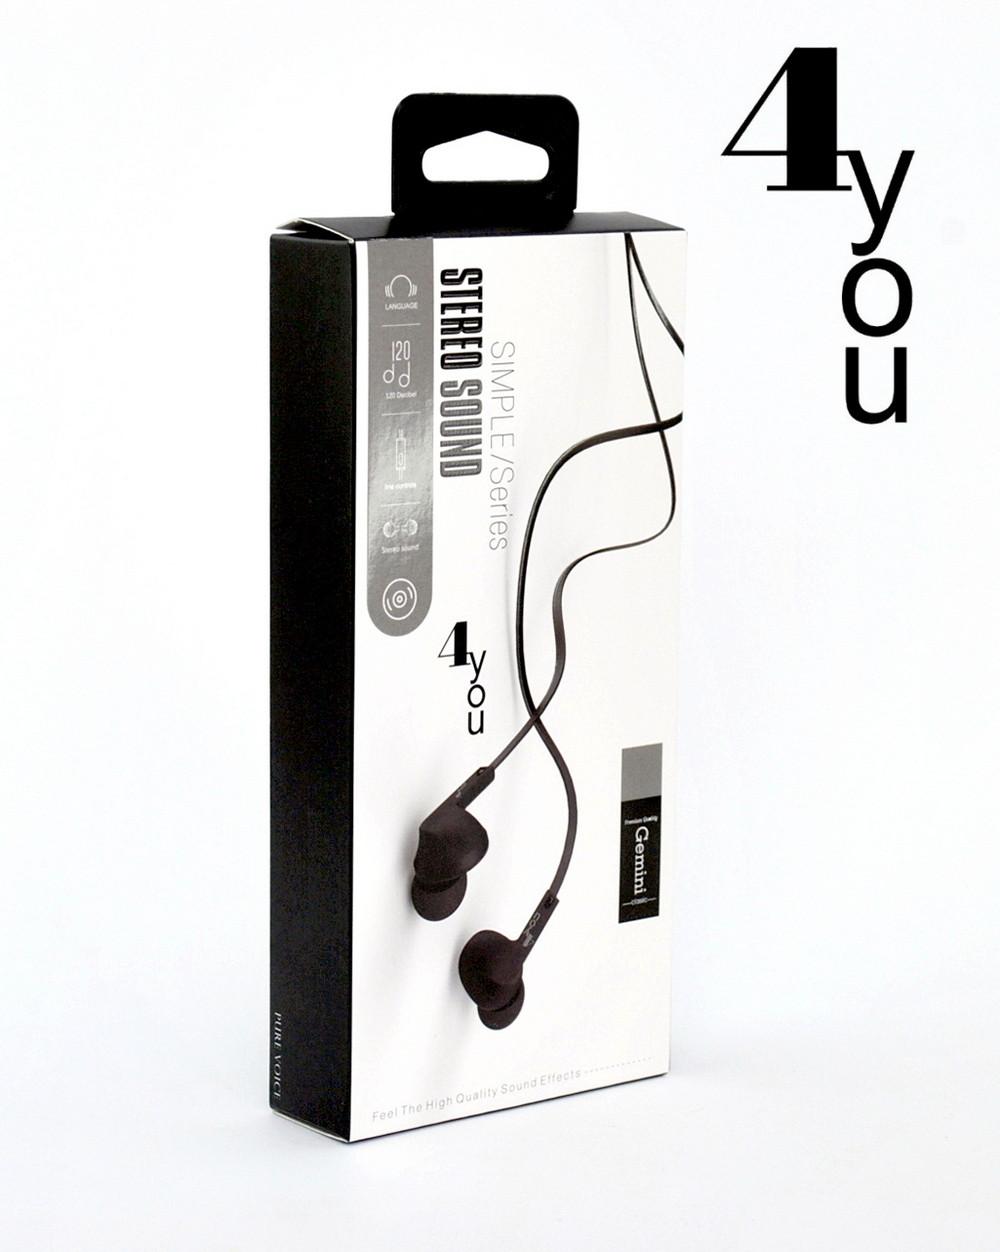 Гарнитура 4you GEMINI (плоский шнур, sport) black